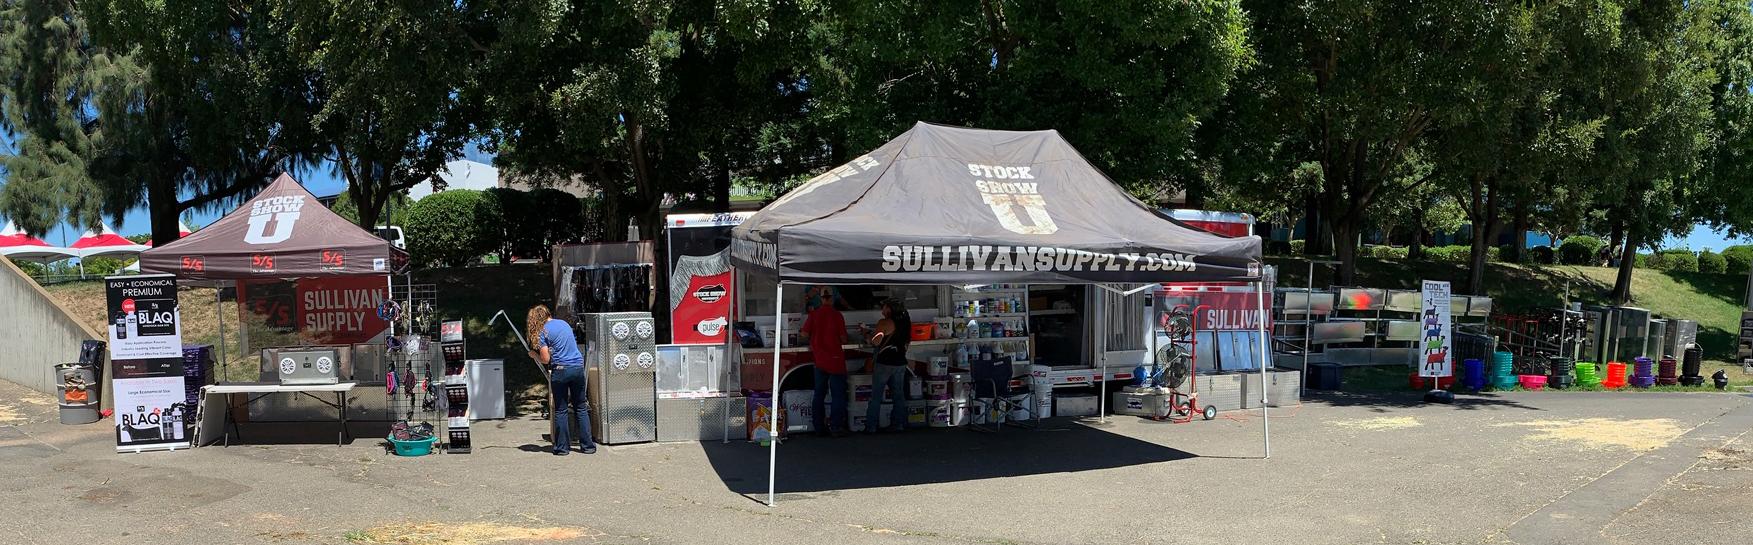 Sullivan Supply @ California State Fair | The Pulse